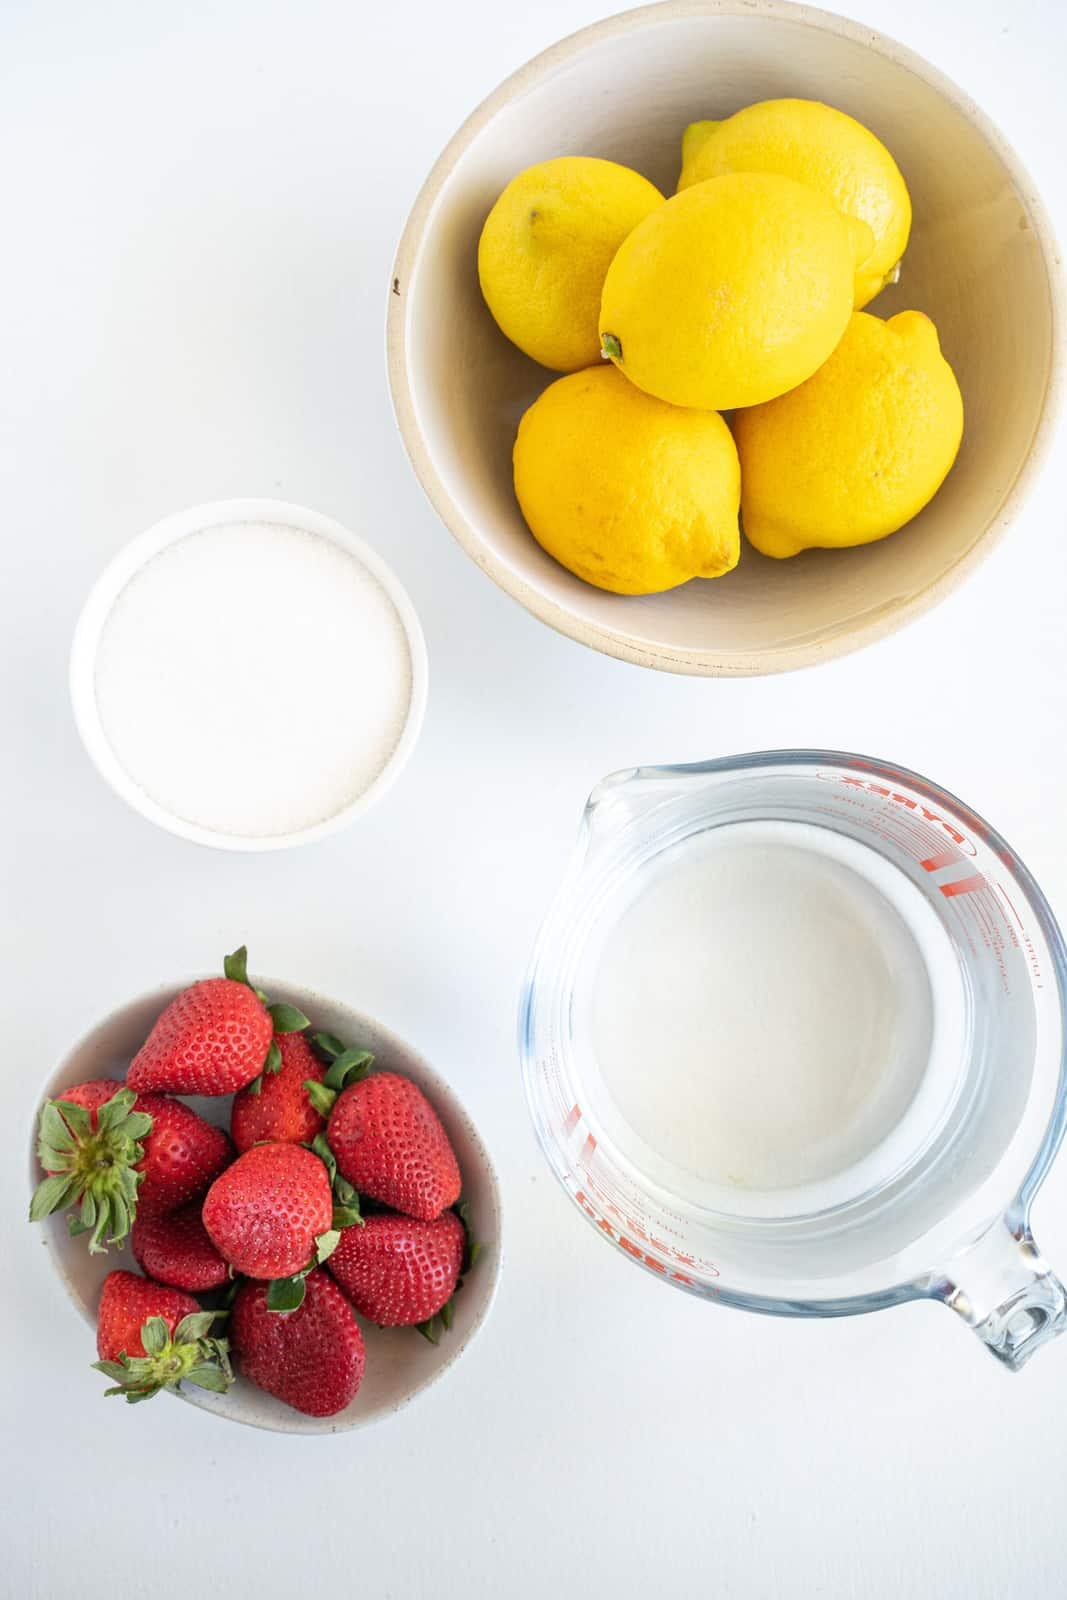 Ingredients needed to make Strawberry Lemonade